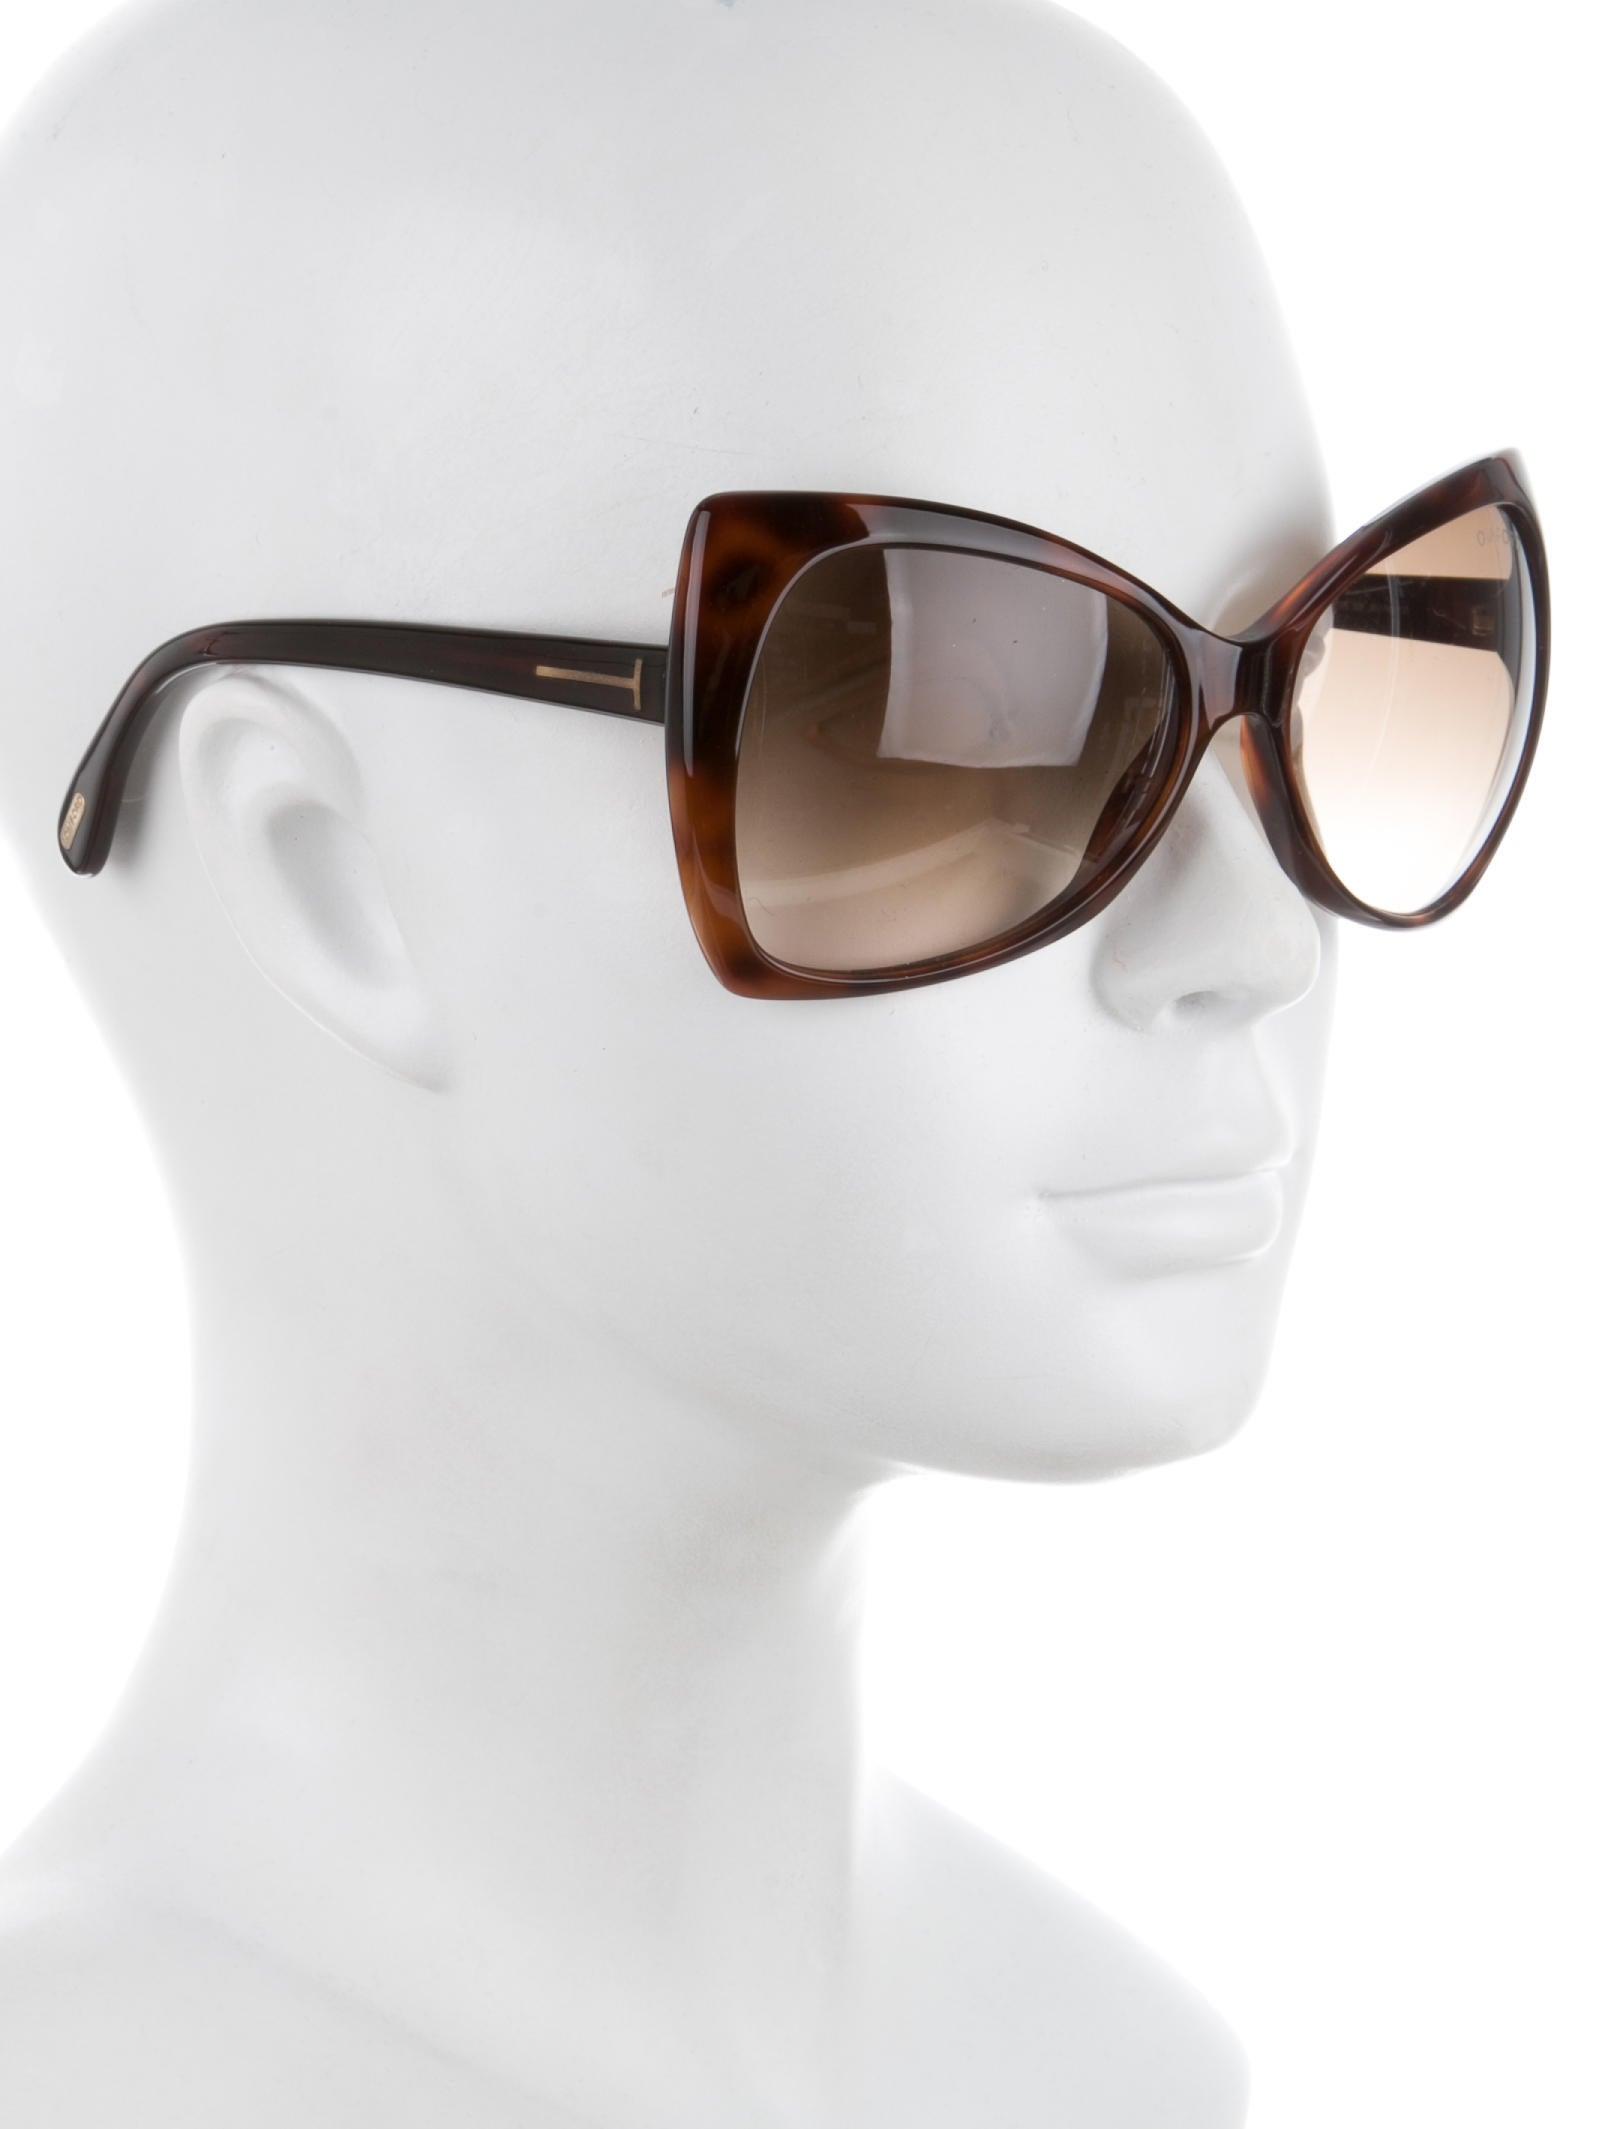 832a0c261b45 ... Tom Ford Nico Sunglasses - Accessories - TOM33320